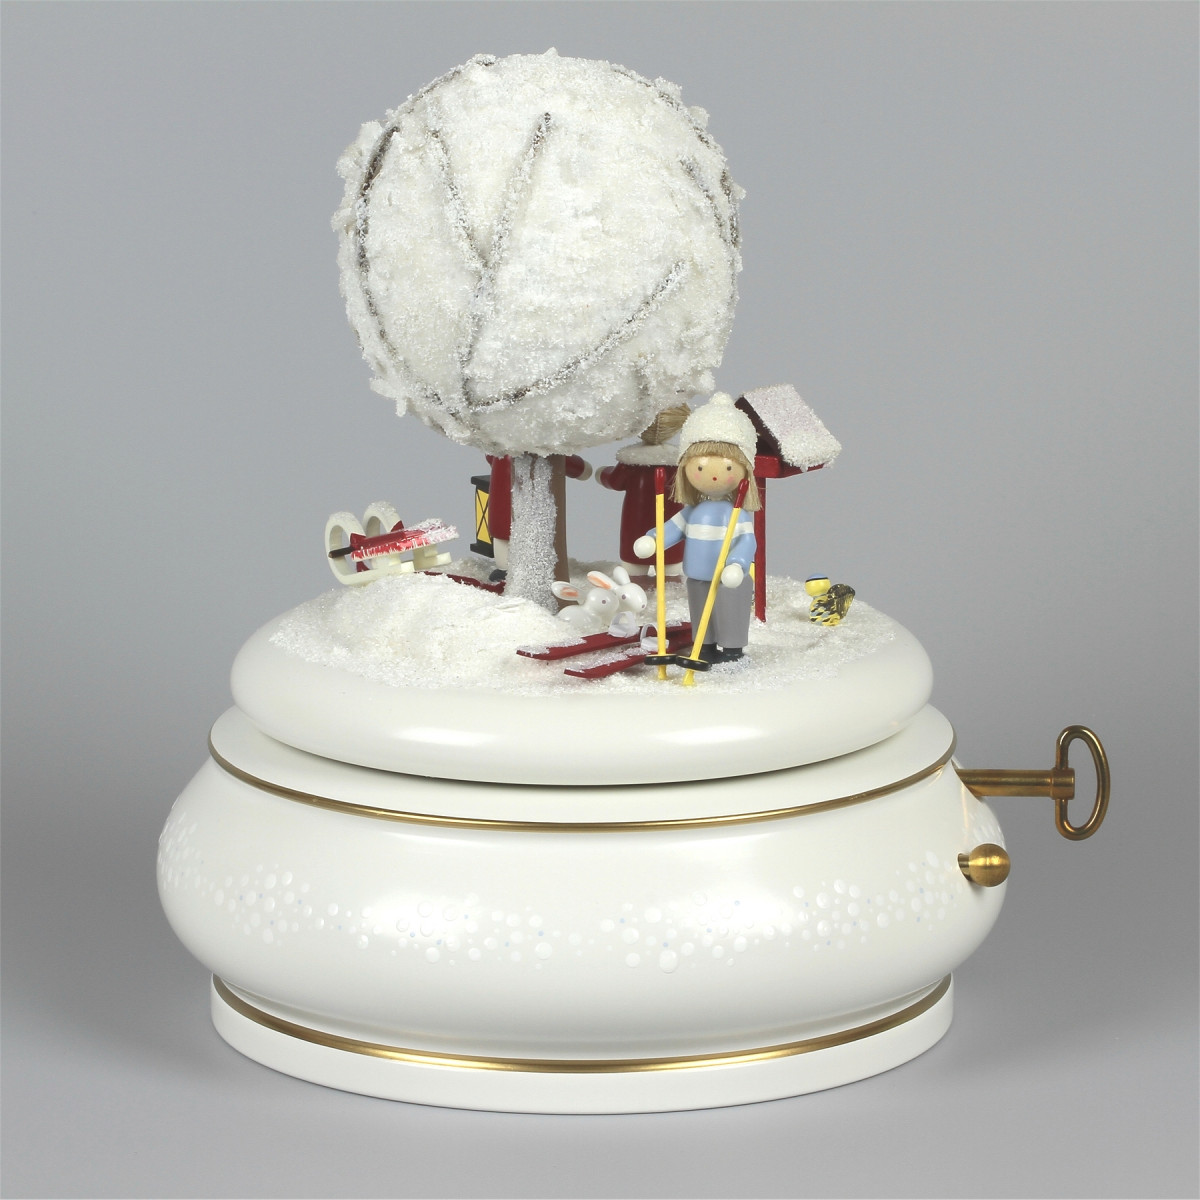 spieldose der alte apfelbaum winter erzgebirgskunst drechsel. Black Bedroom Furniture Sets. Home Design Ideas